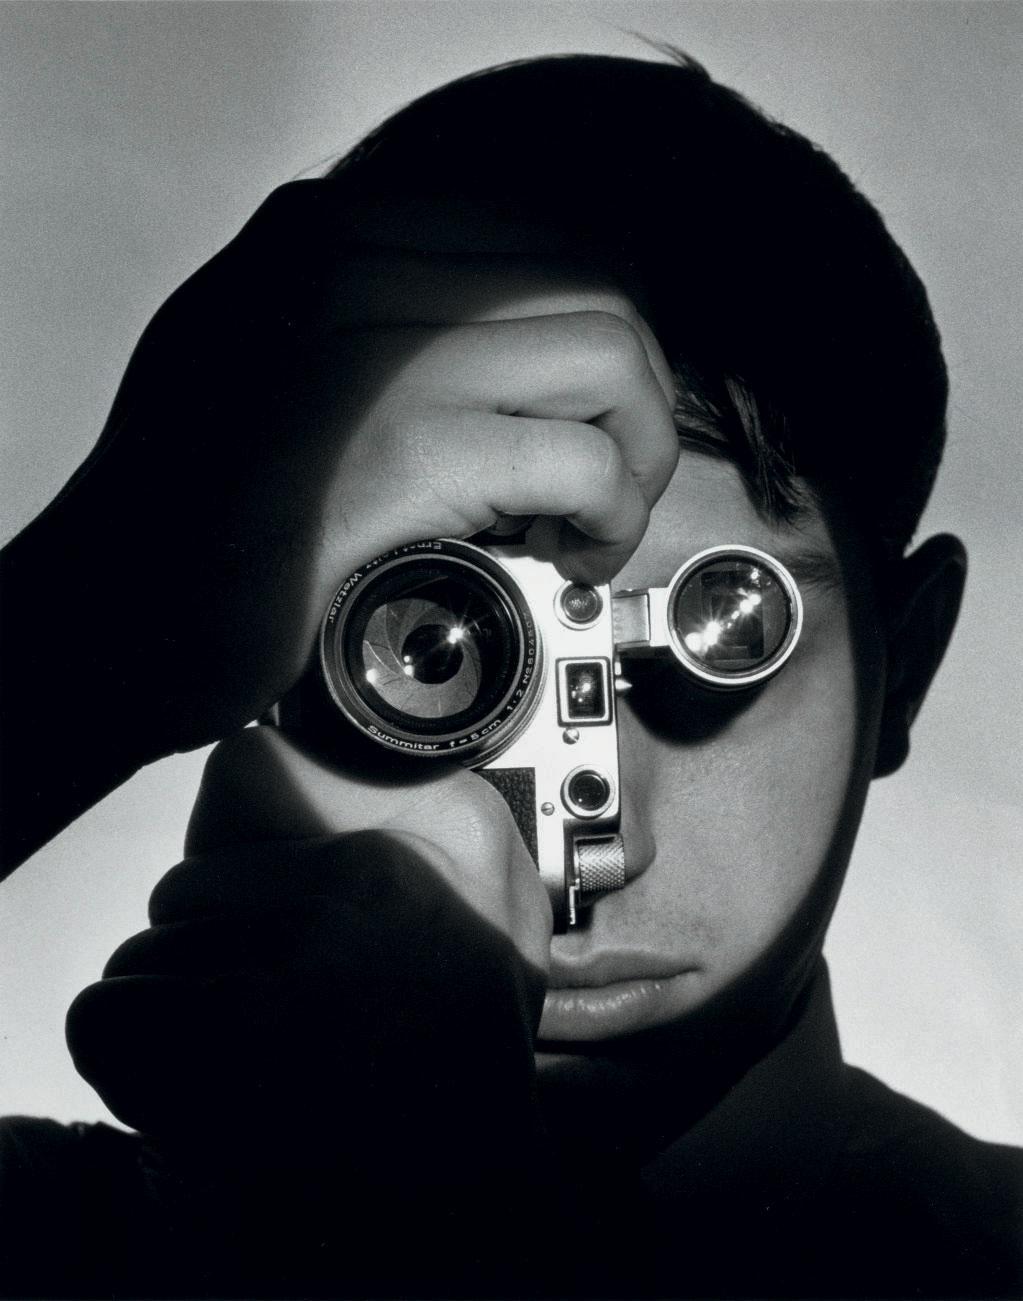 The Photojournalist, 1955